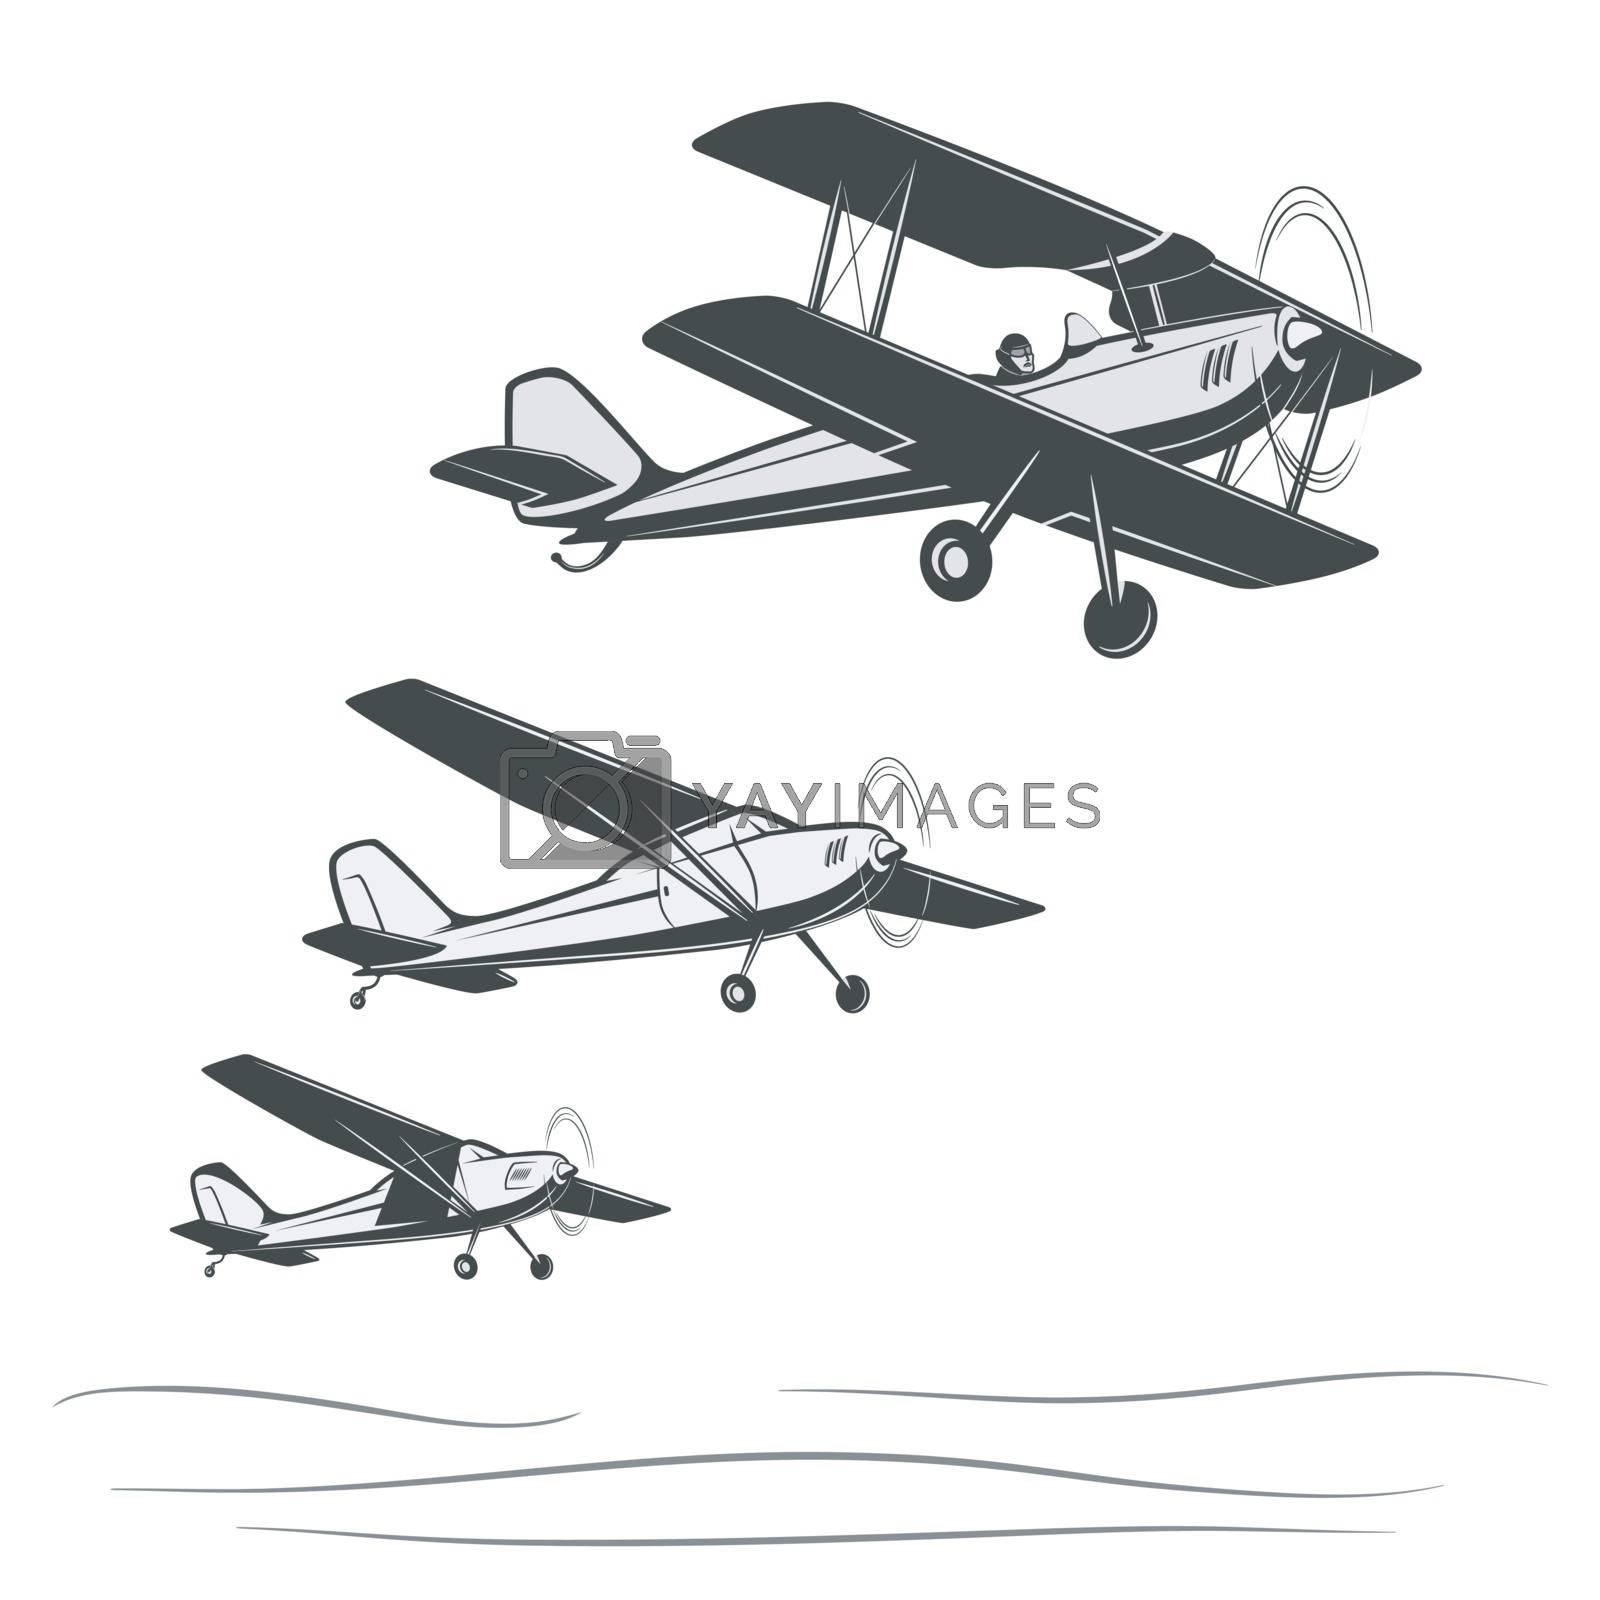 Parade of three retro airplanes. Monochrome vintage pattern.